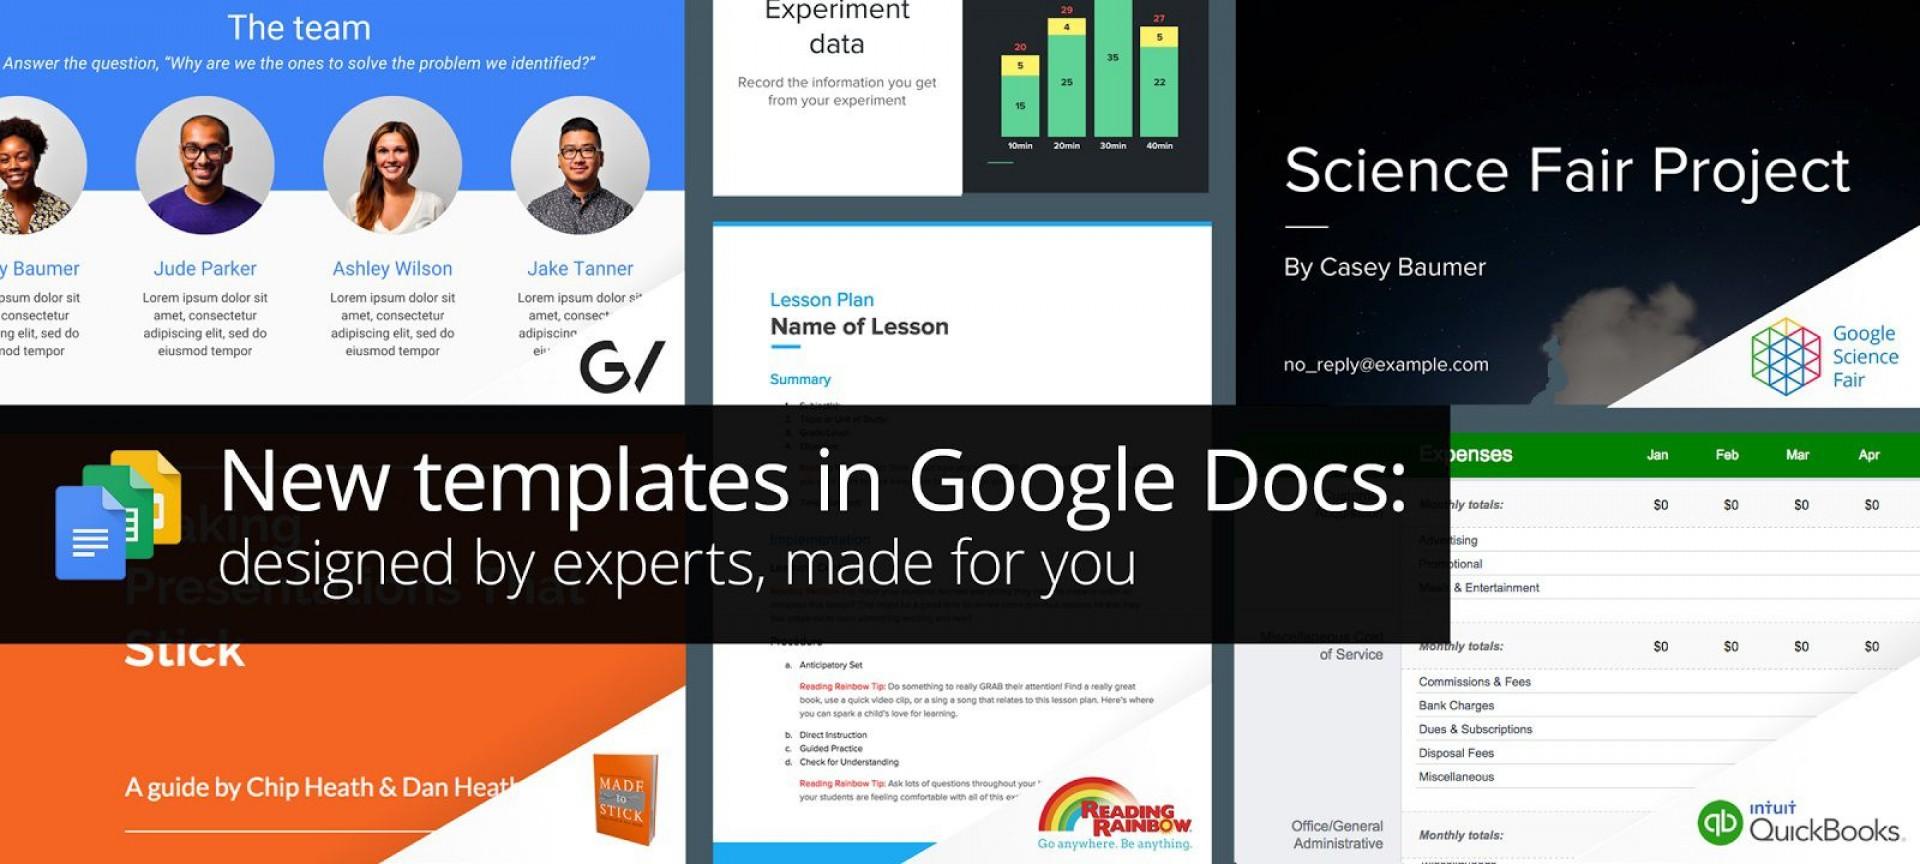 006 Frightening Free Google Doc Template Sample  Templates Menu For Teacher Flyer Download1920